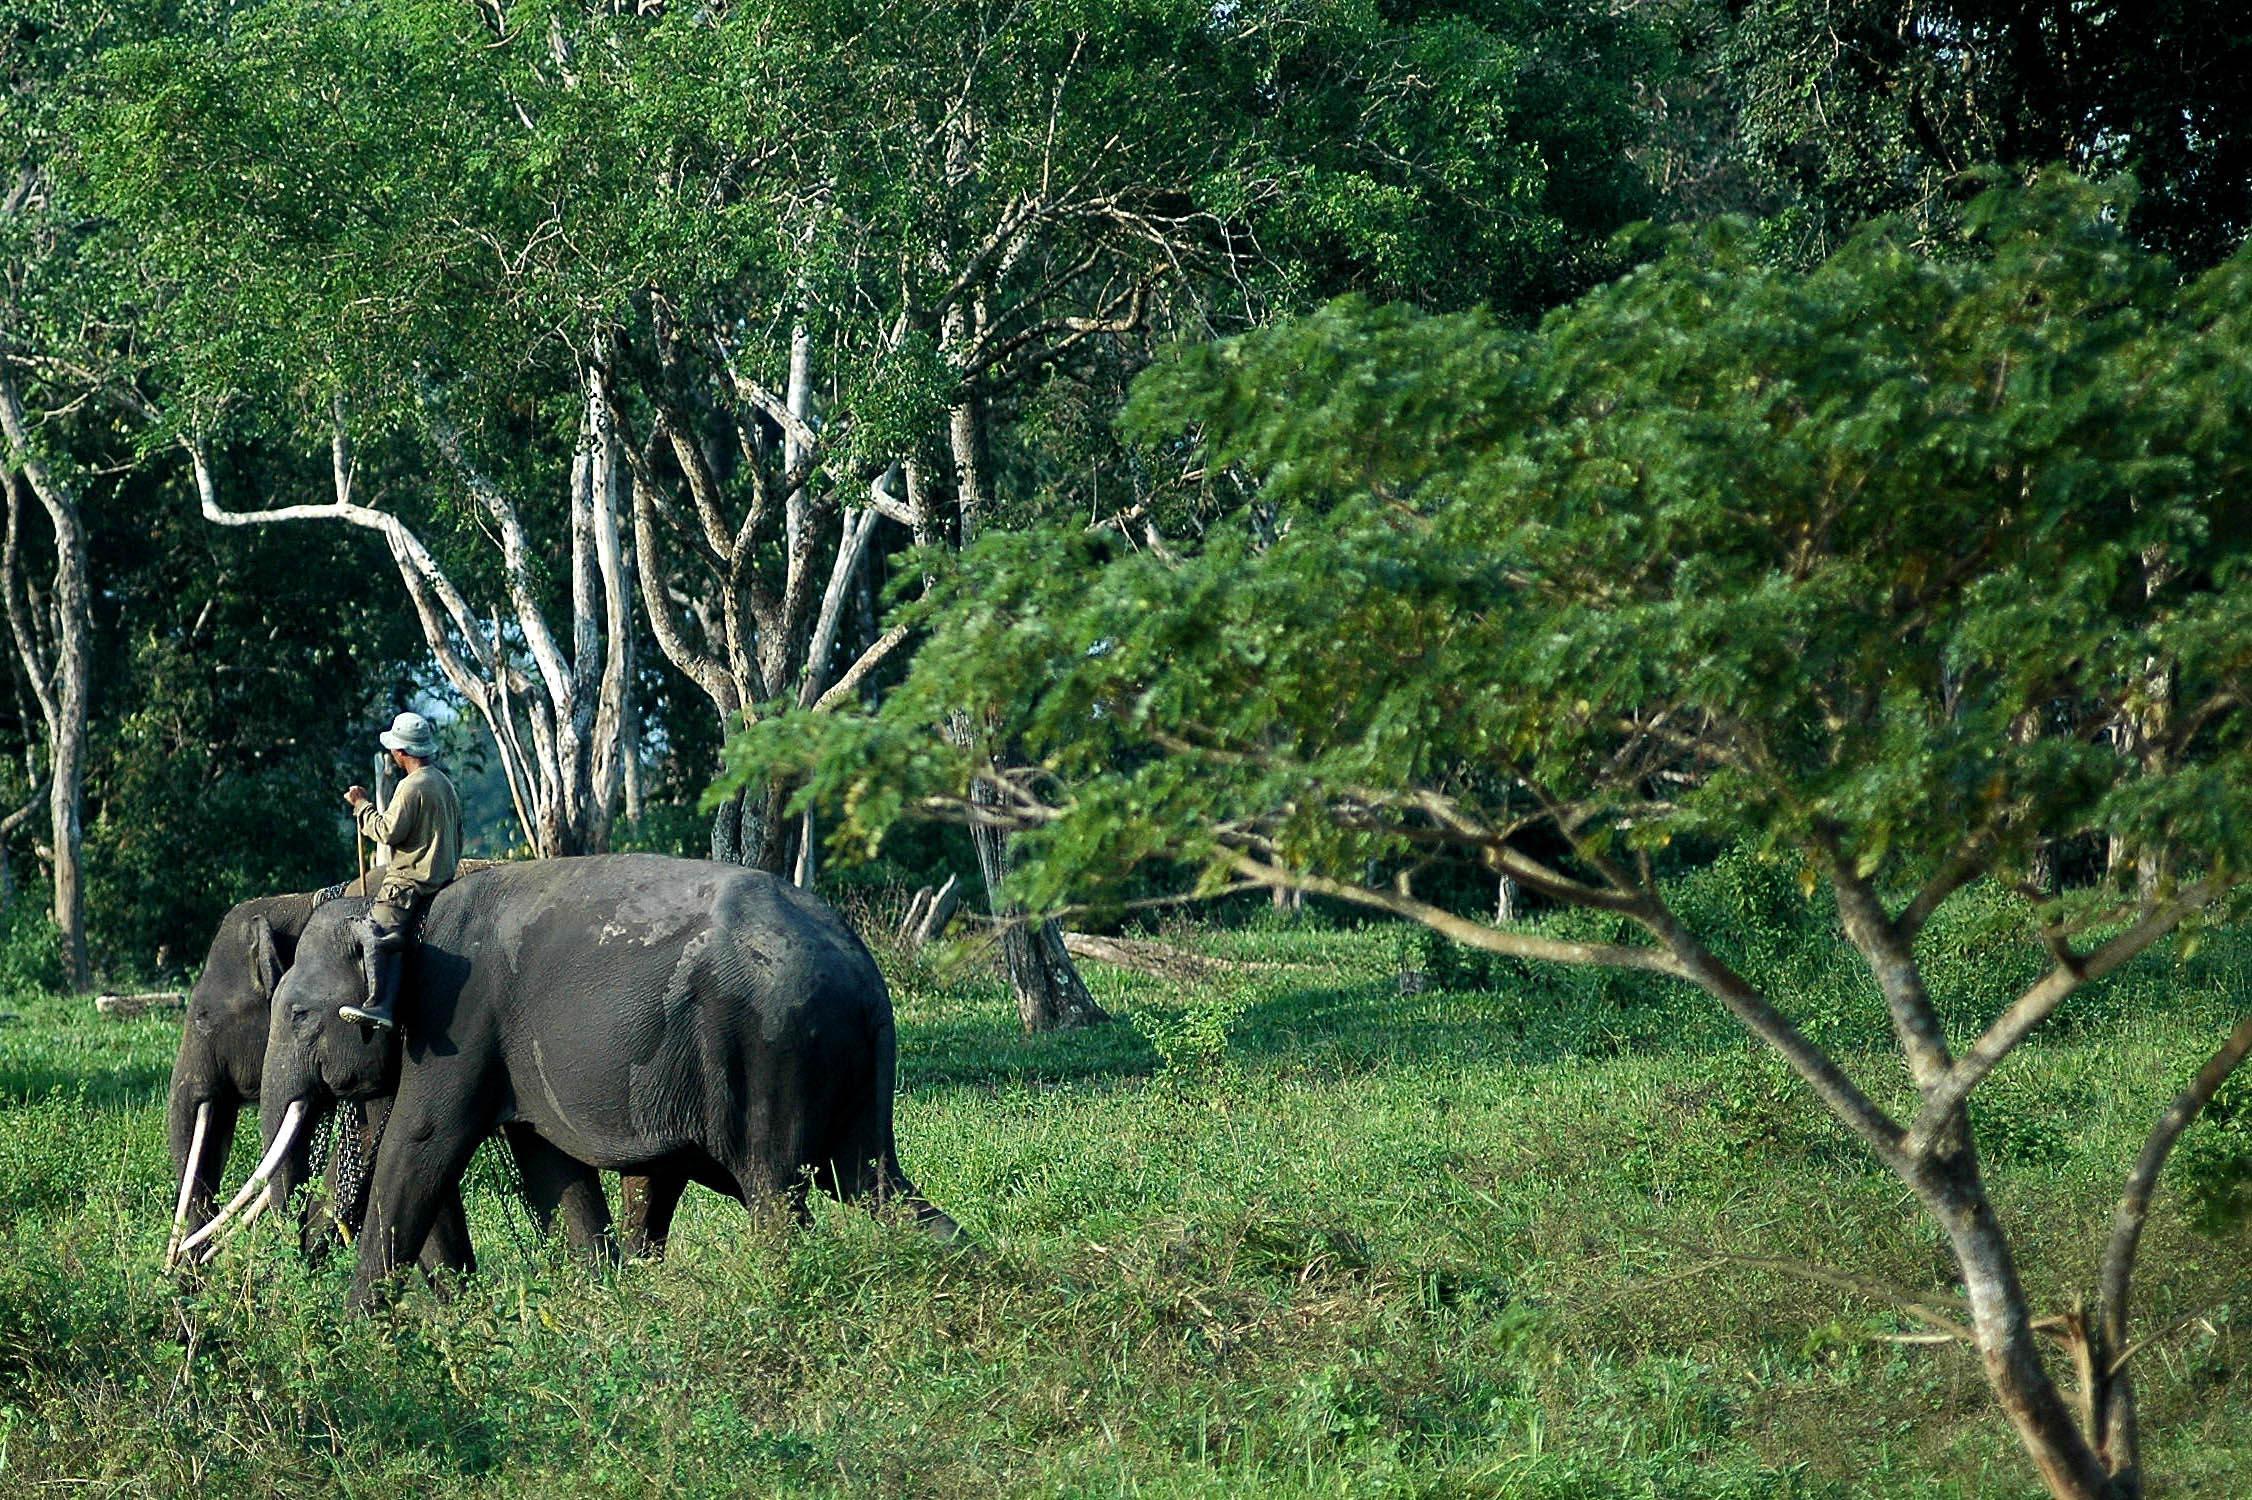 Tempat Wajib Kunjungi Lampung Toko Mesin Kota Bisa Taman Nasional